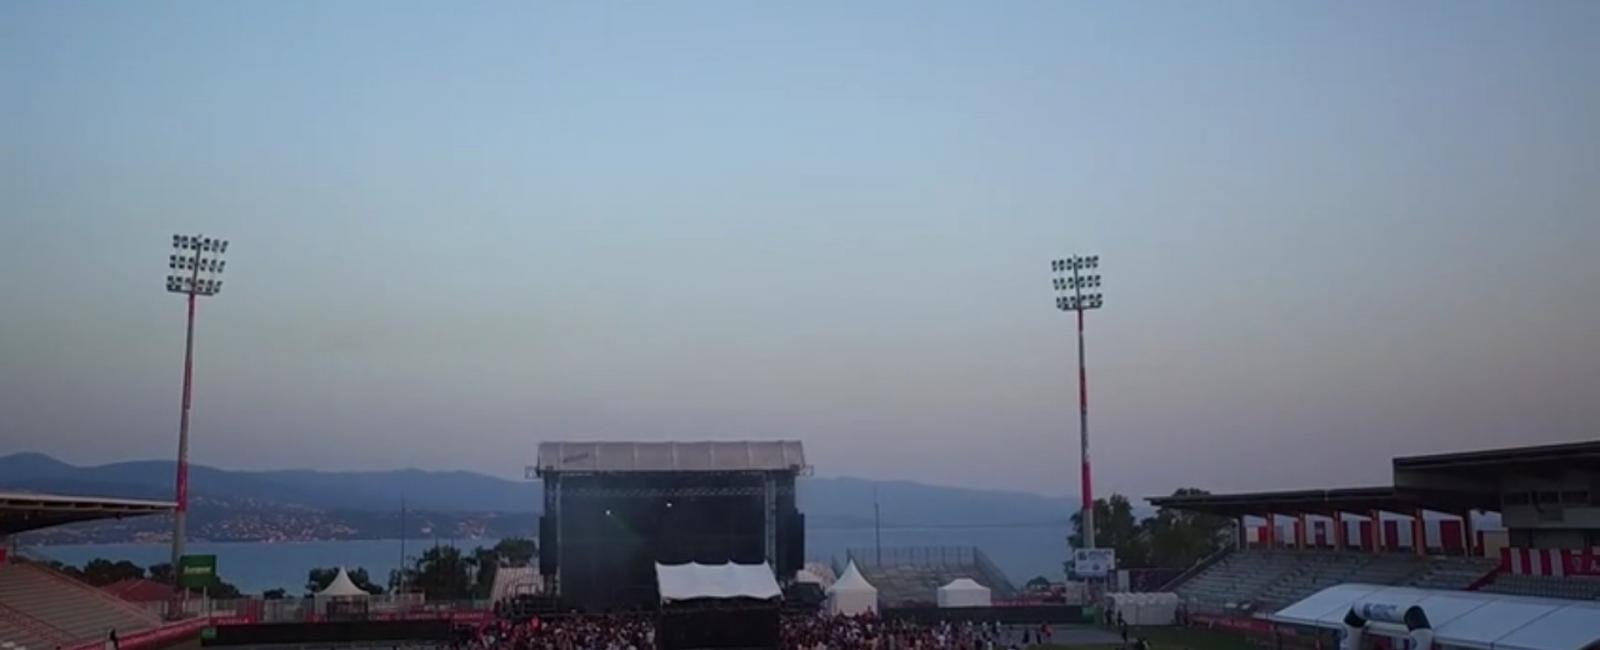 Festival Mi ! - Ajaccio